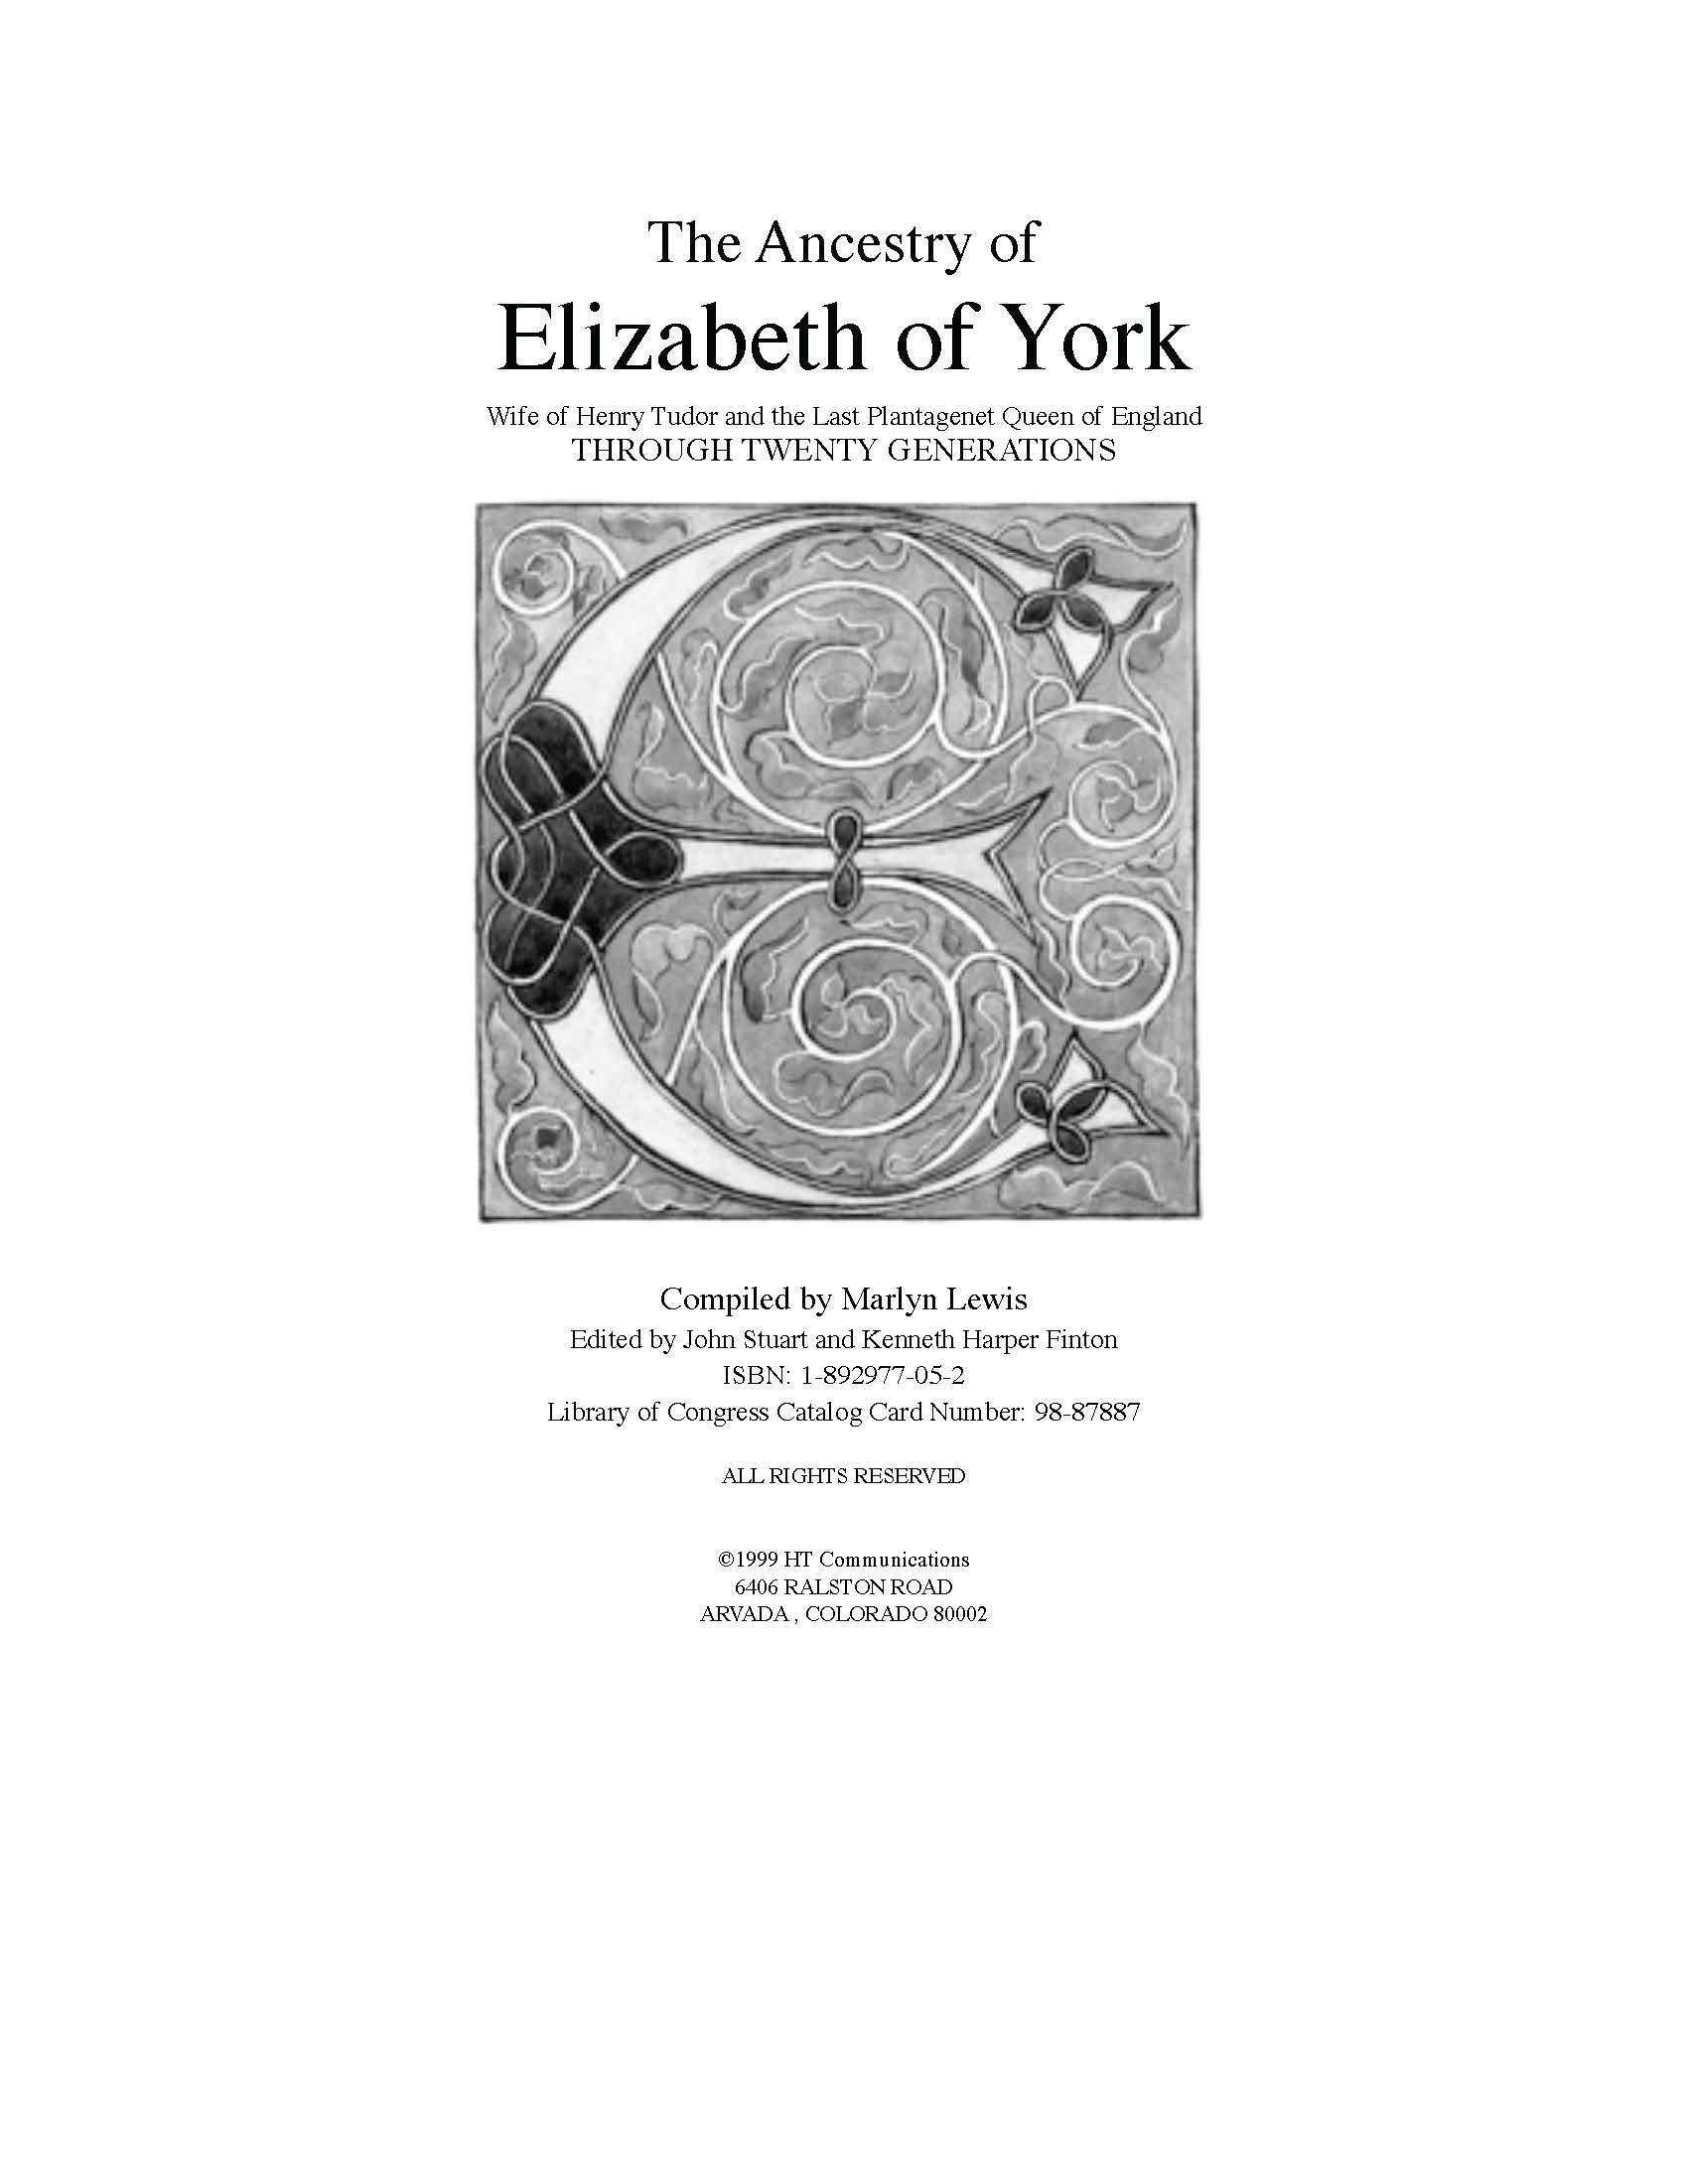 ELIZABETH OF YORK ANCESTRY